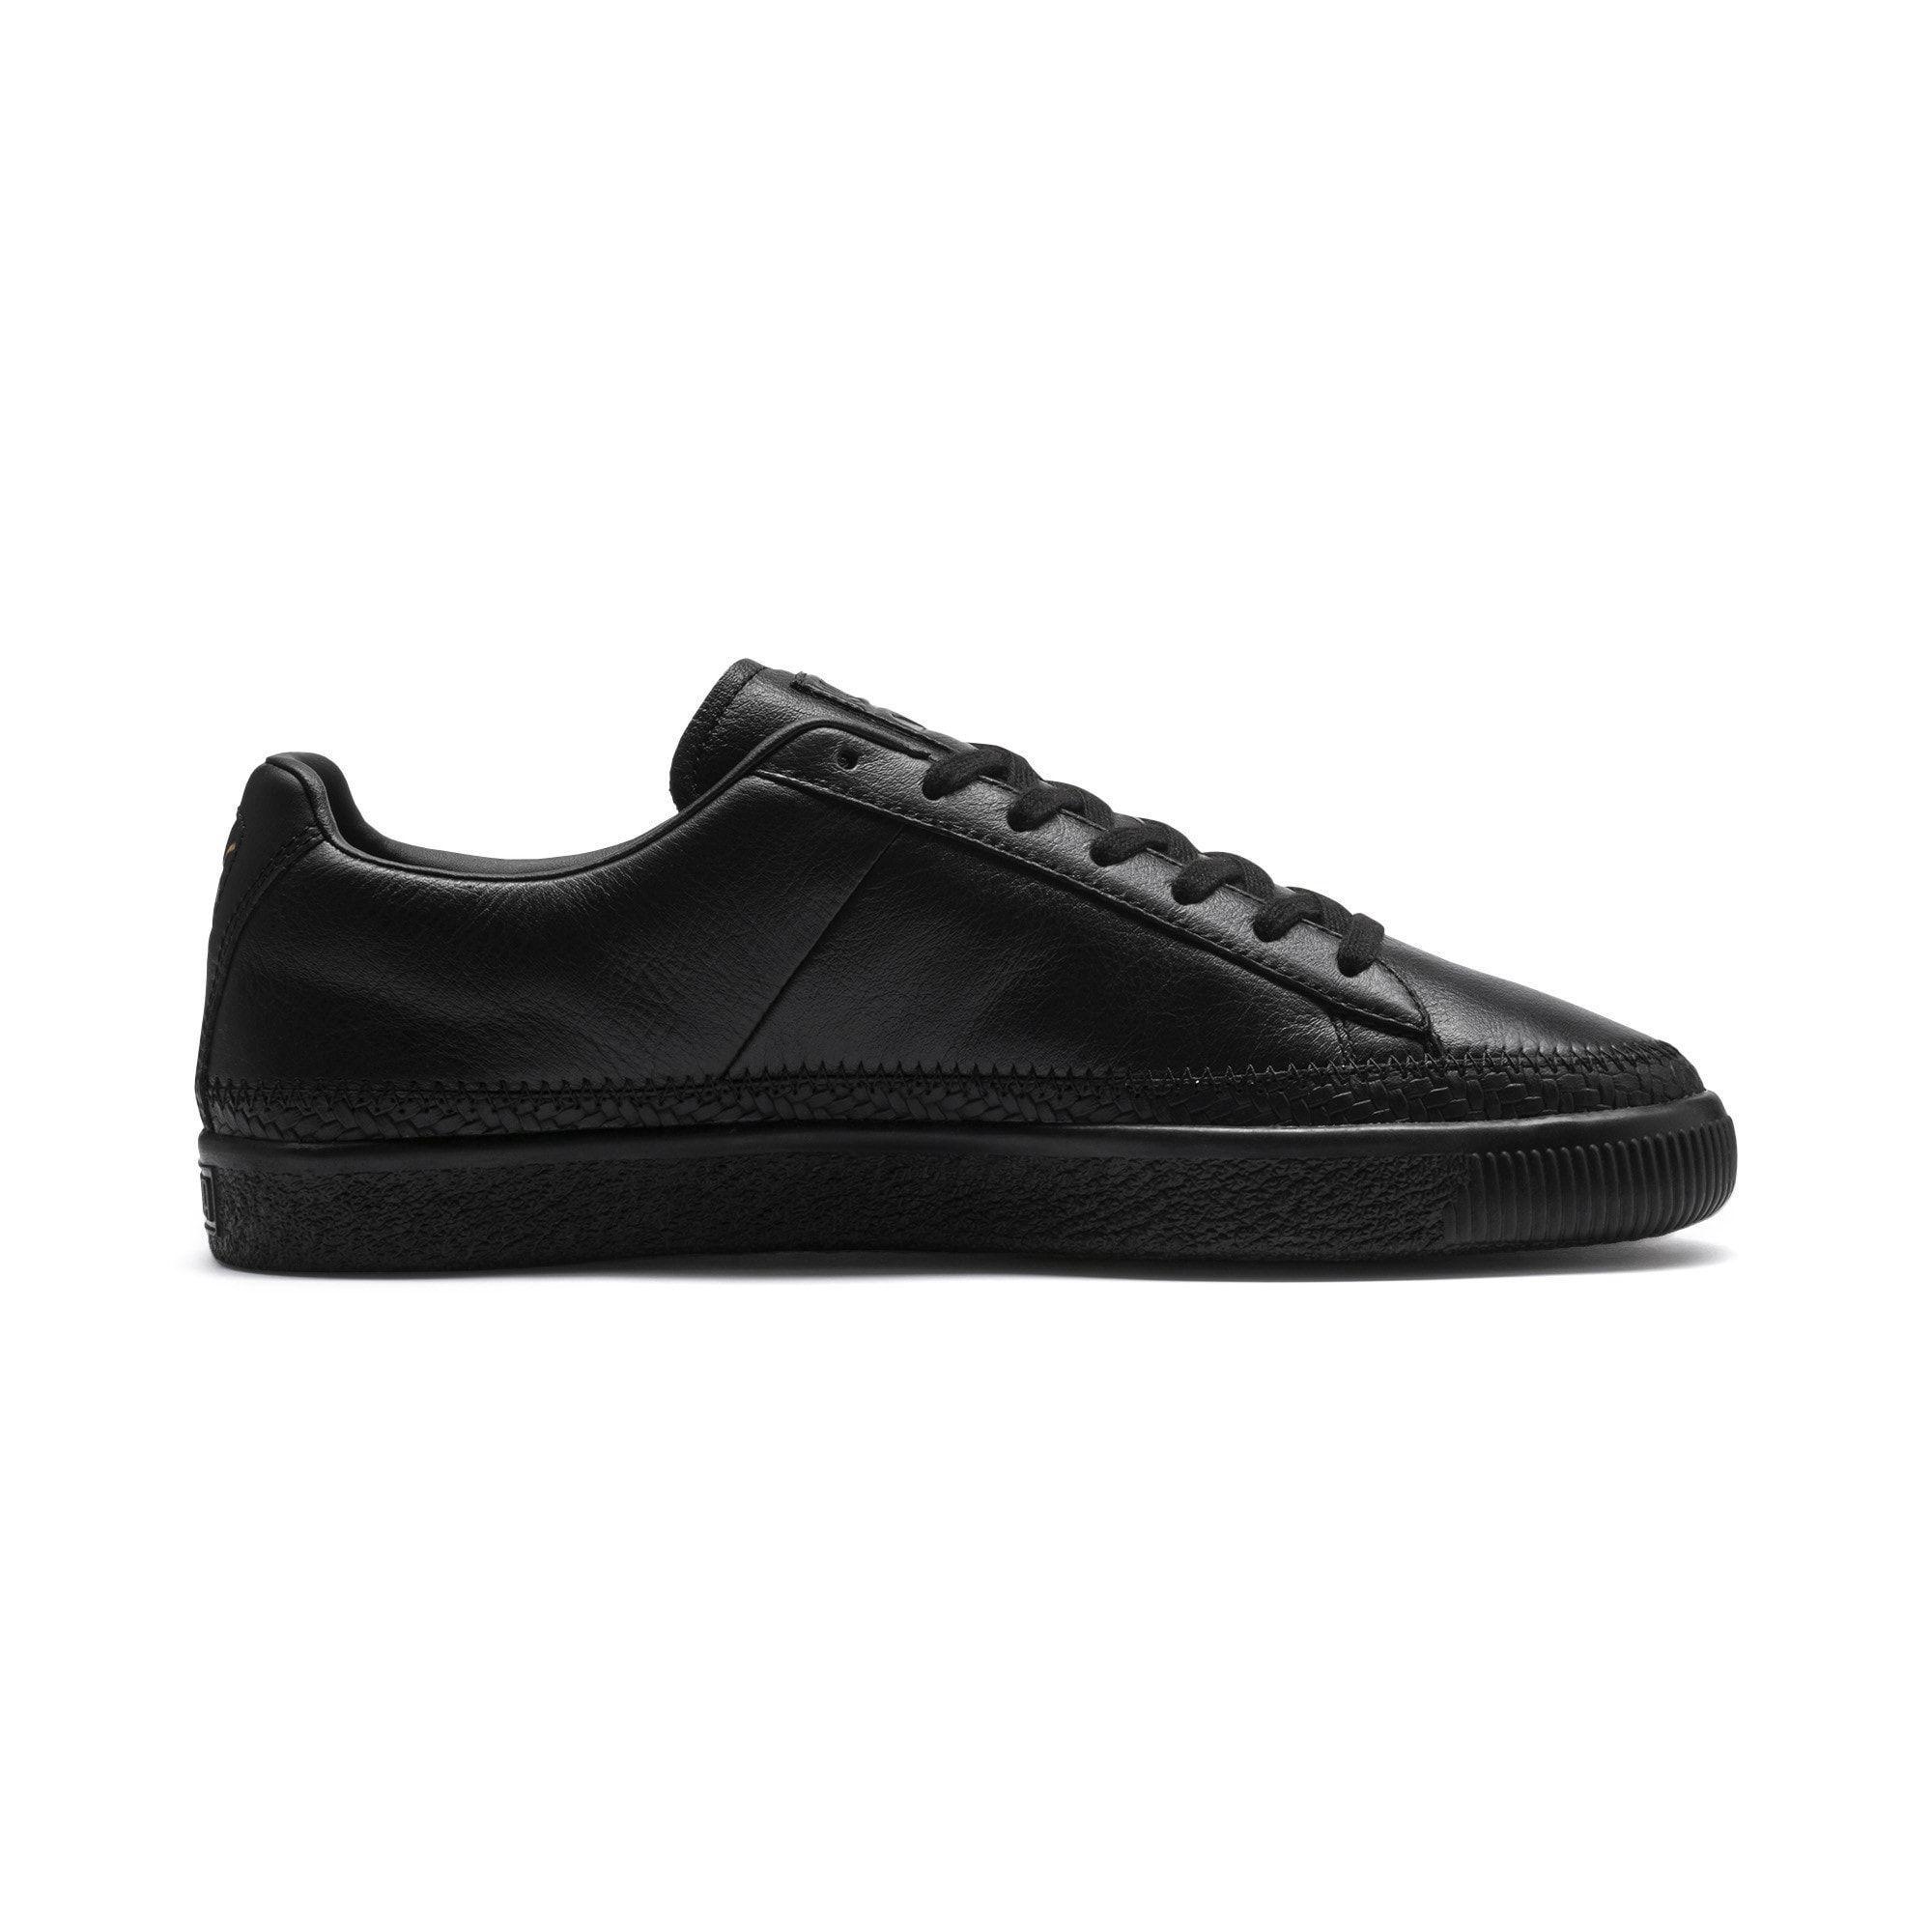 Most Recent Pic Puma Sneaker Basket Trim Damen Schwarz Grosse 44 5 Popular On Warm Summer Days Every Little Bit Of Cloth On Your Louis Vuitton Shoes Heels